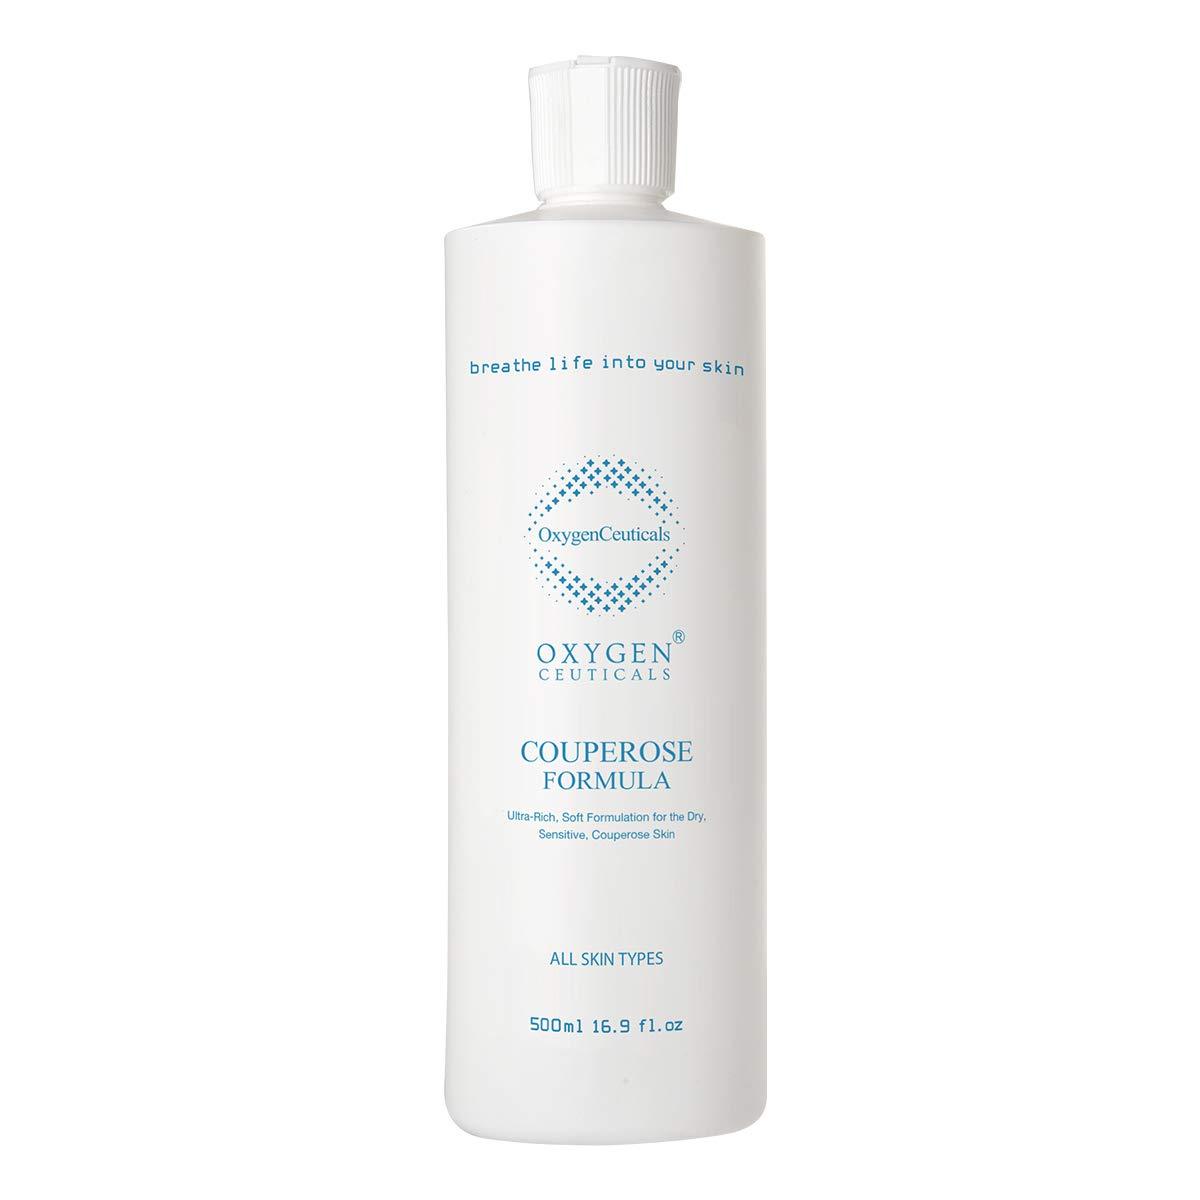 OxygenCeuticals Couperose Formula, 500 ml/1.69 oz, Oxygen Facial Liquid Based Face and Neck Serum, For Sensitive Skin